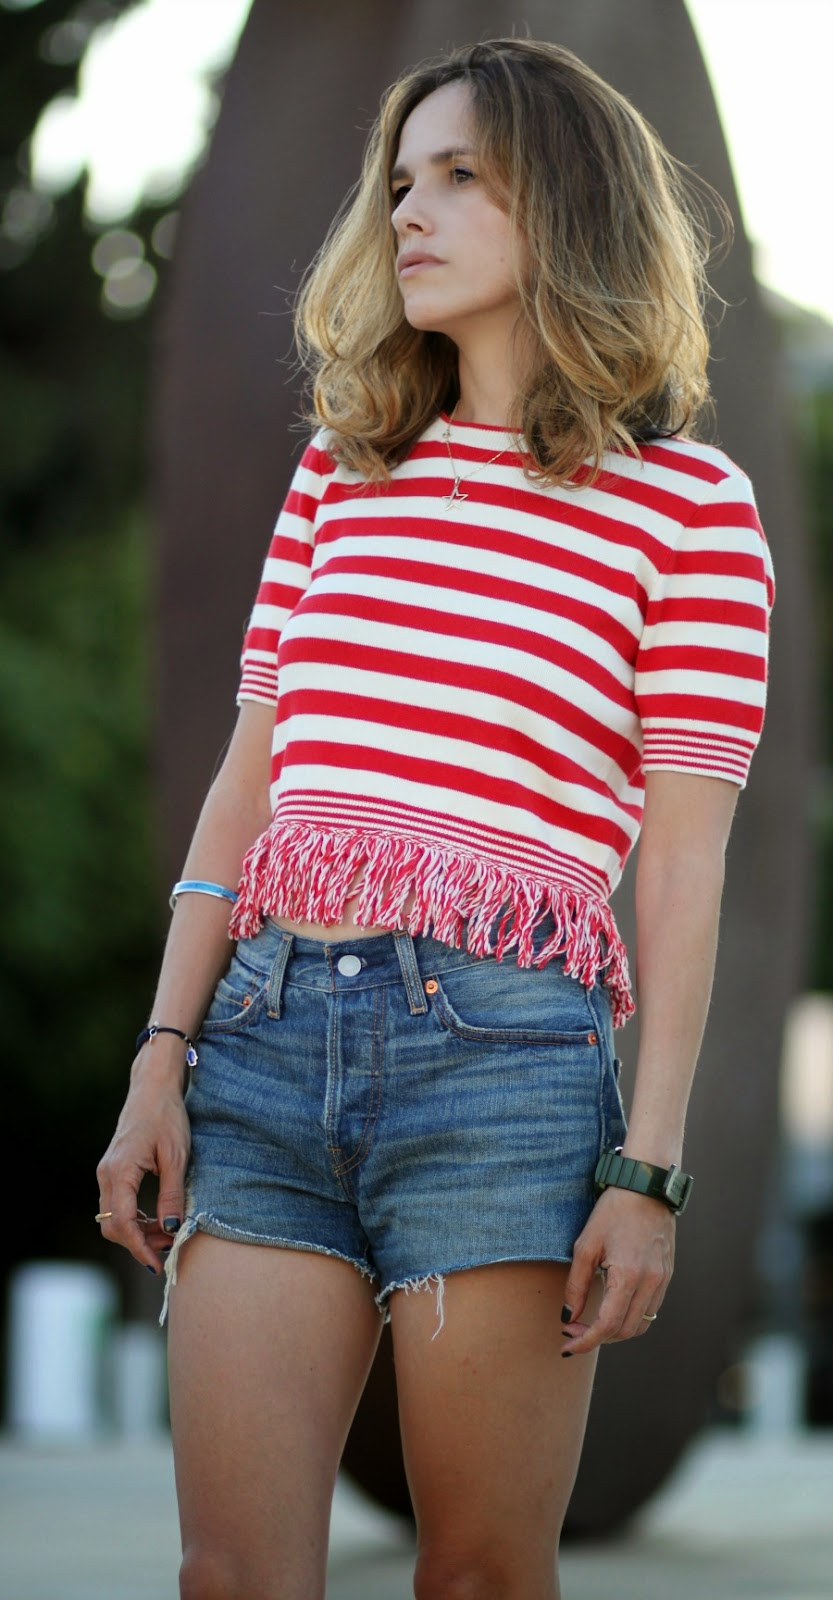 501, levi's, shortdenims, style, lookoftheday, stripes, fashionblog, bradpiit, אופנה, בלוגאופנה